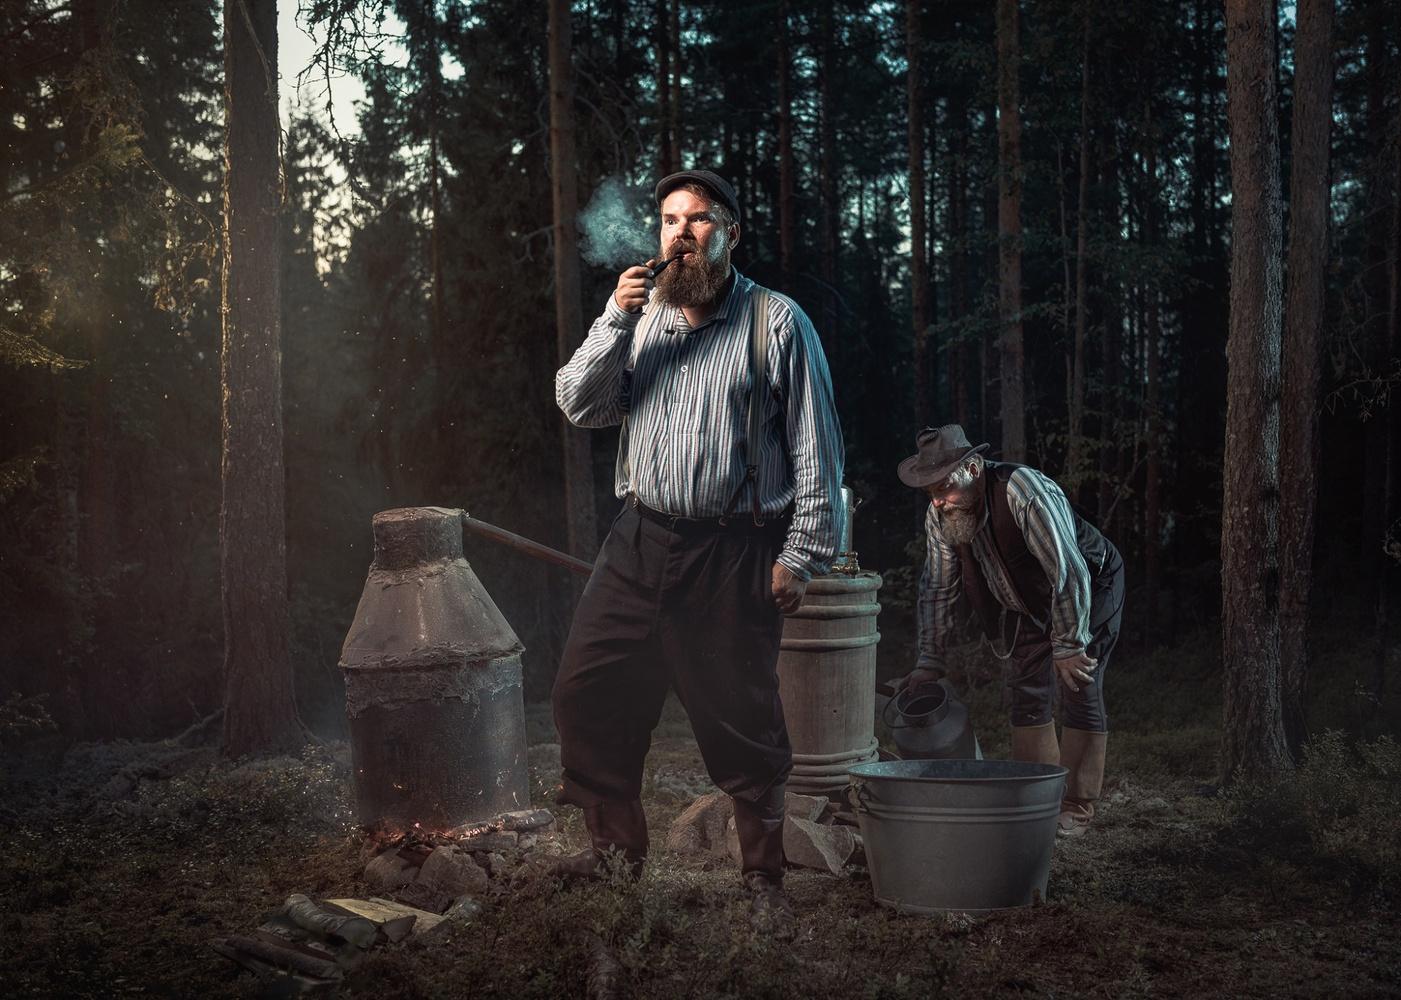 Moonshiners by Juhamatti Vahdersalo